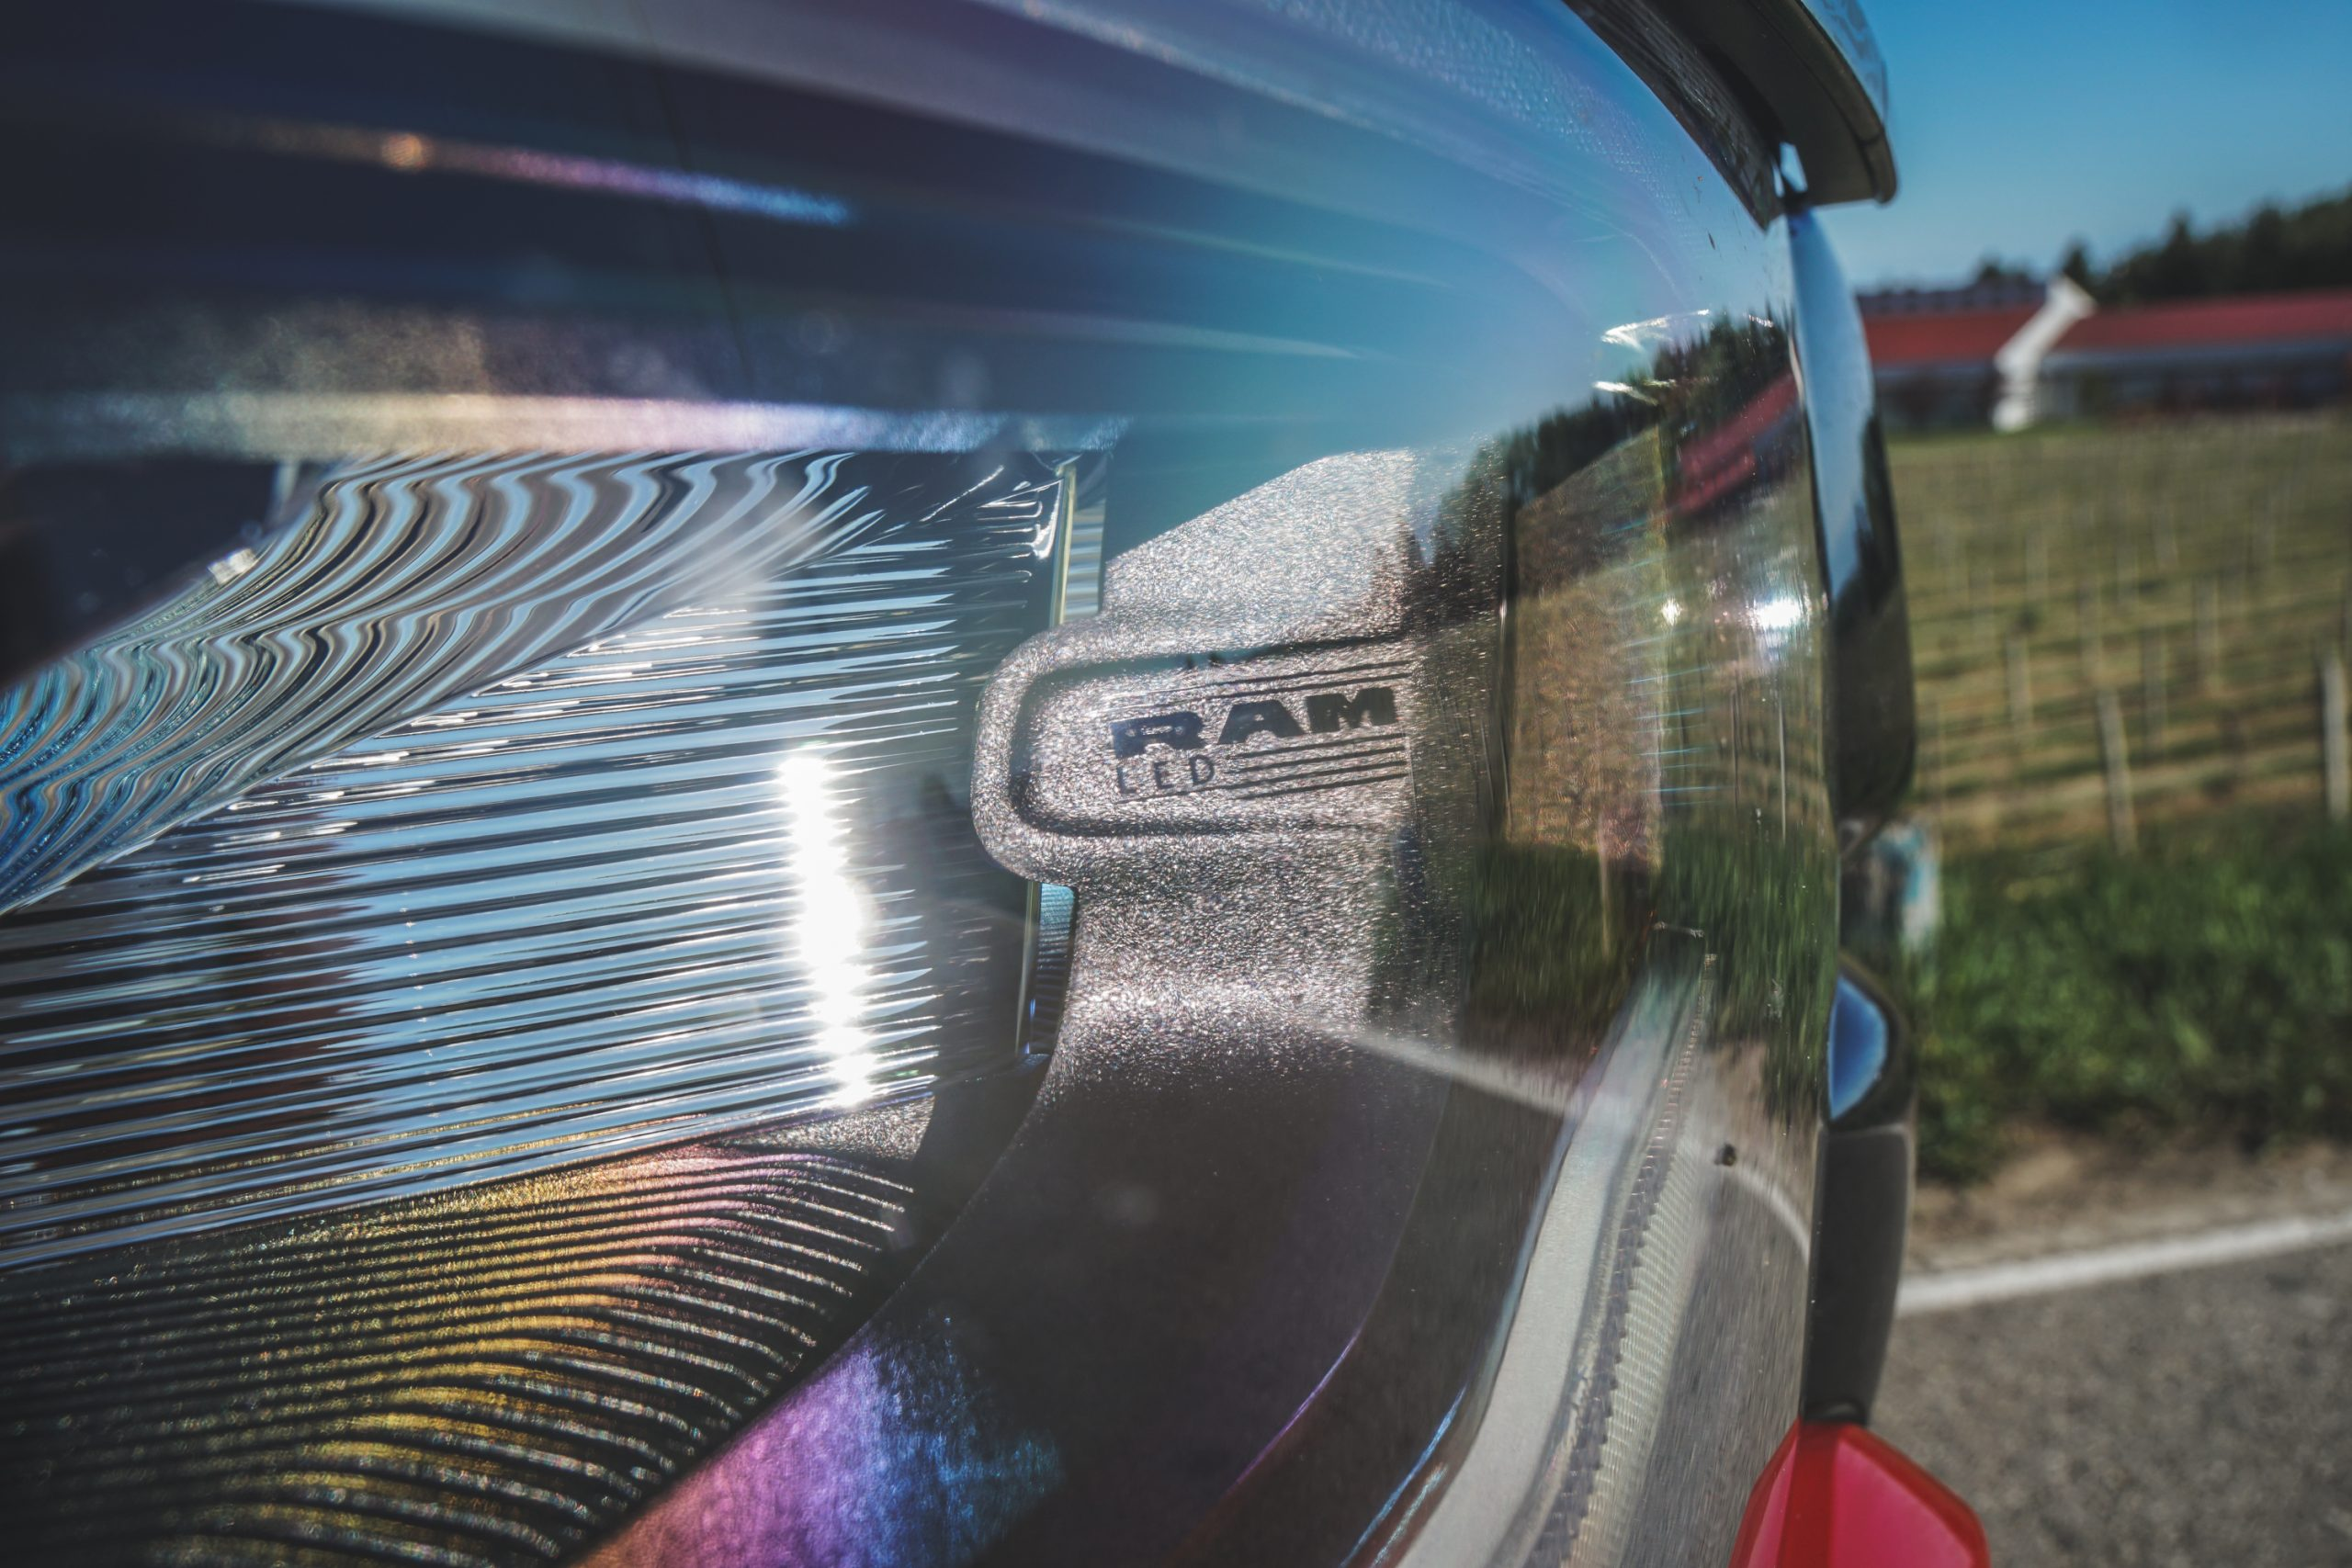 2020 Ram 1500 Laramie front LED headlights